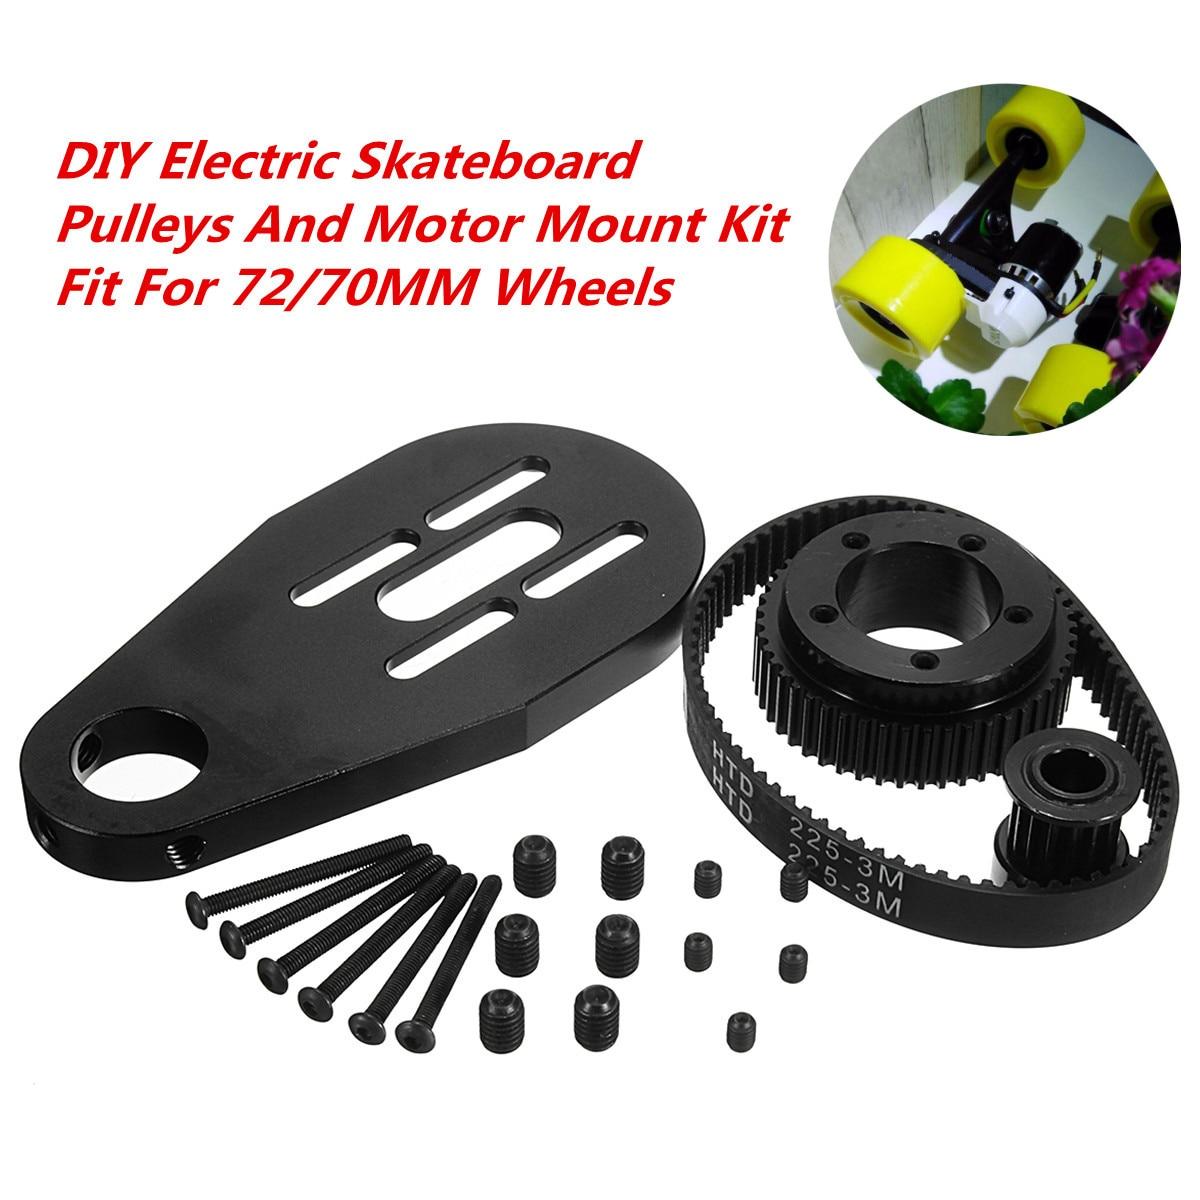 DIY Electric Skateboard Kit Parts Pulleys + Motor Mount +Belt For 72/70MM Wheels Skate Board Pulley